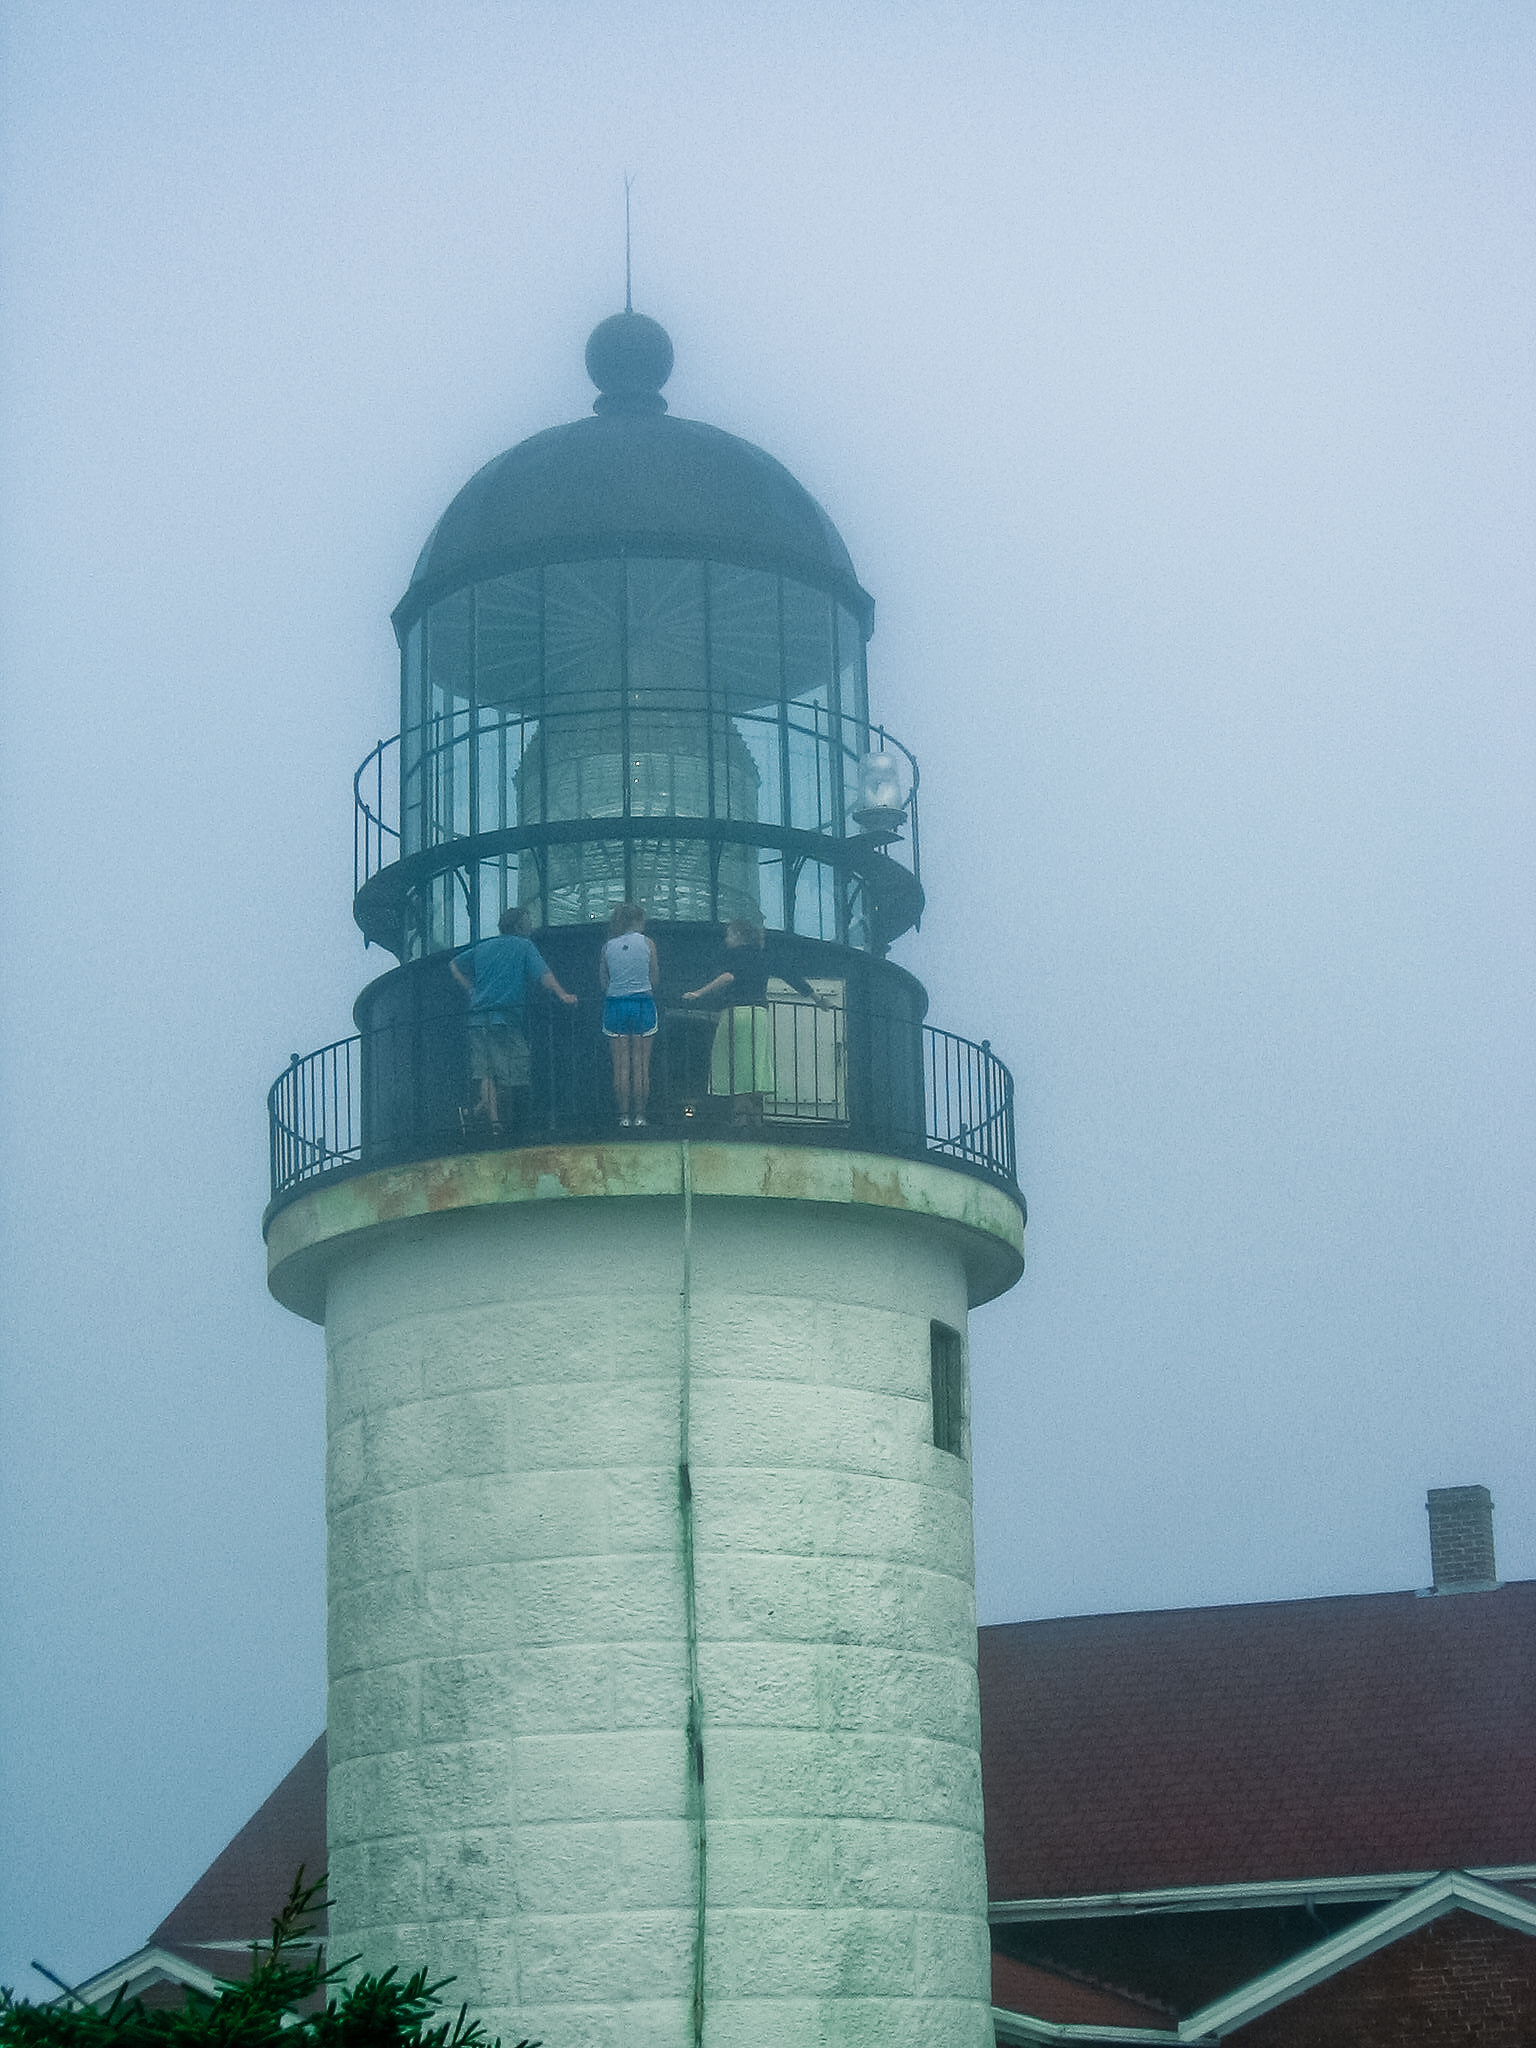 2007 Maine LCS 1 038-1455360720-O